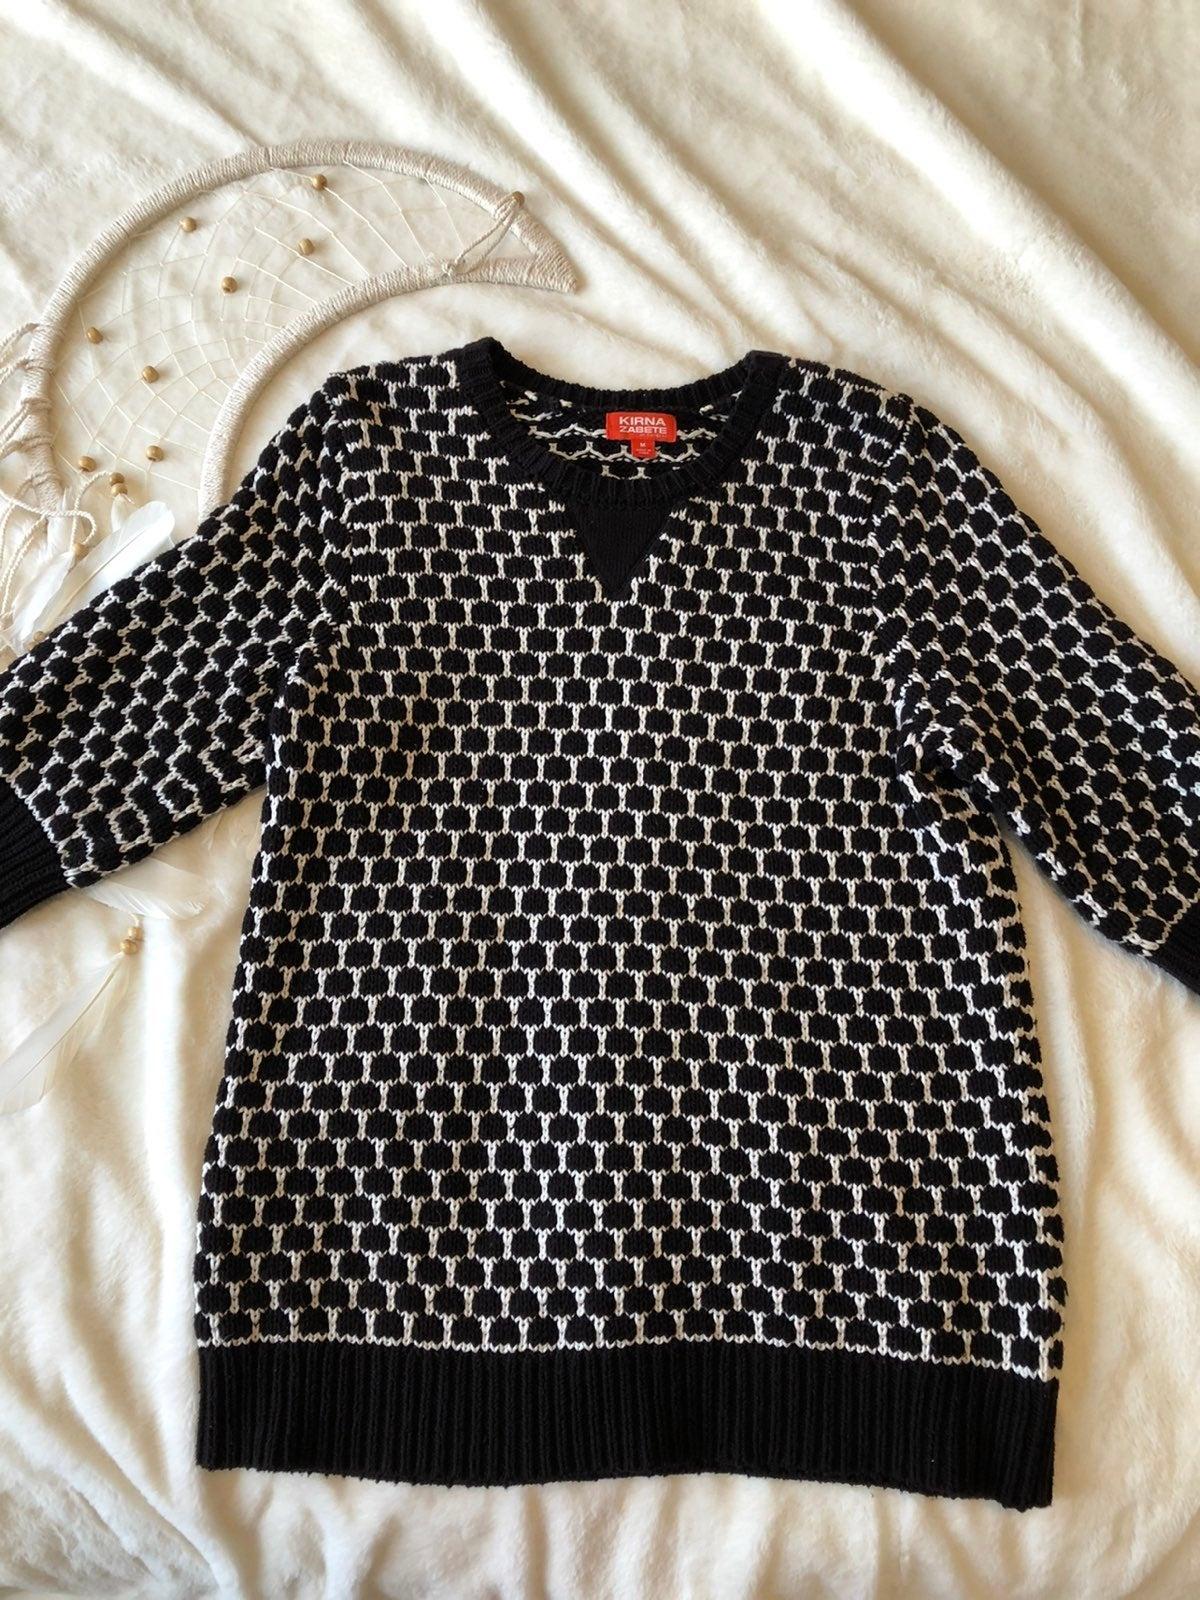 Kirna Zabete chunky sweater